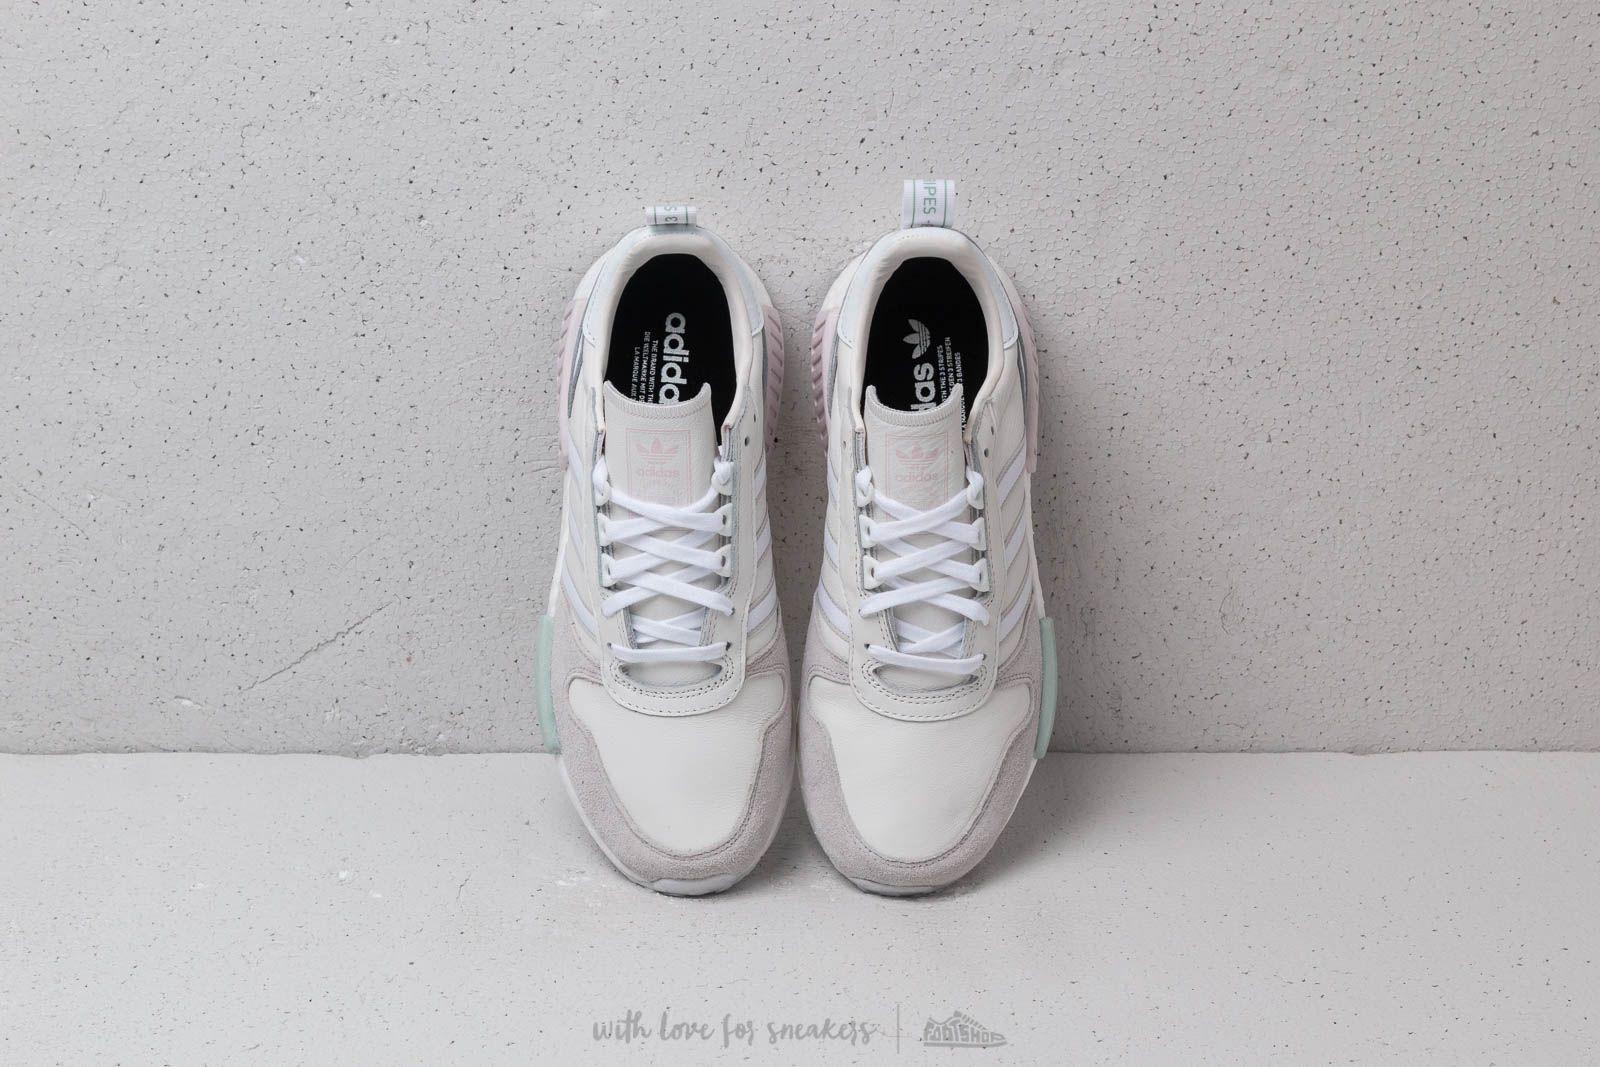 adidas Rising Star x R1 Cloud White  Ftw White  Grey One nagyszerű árakon 50 0cfe4289d4